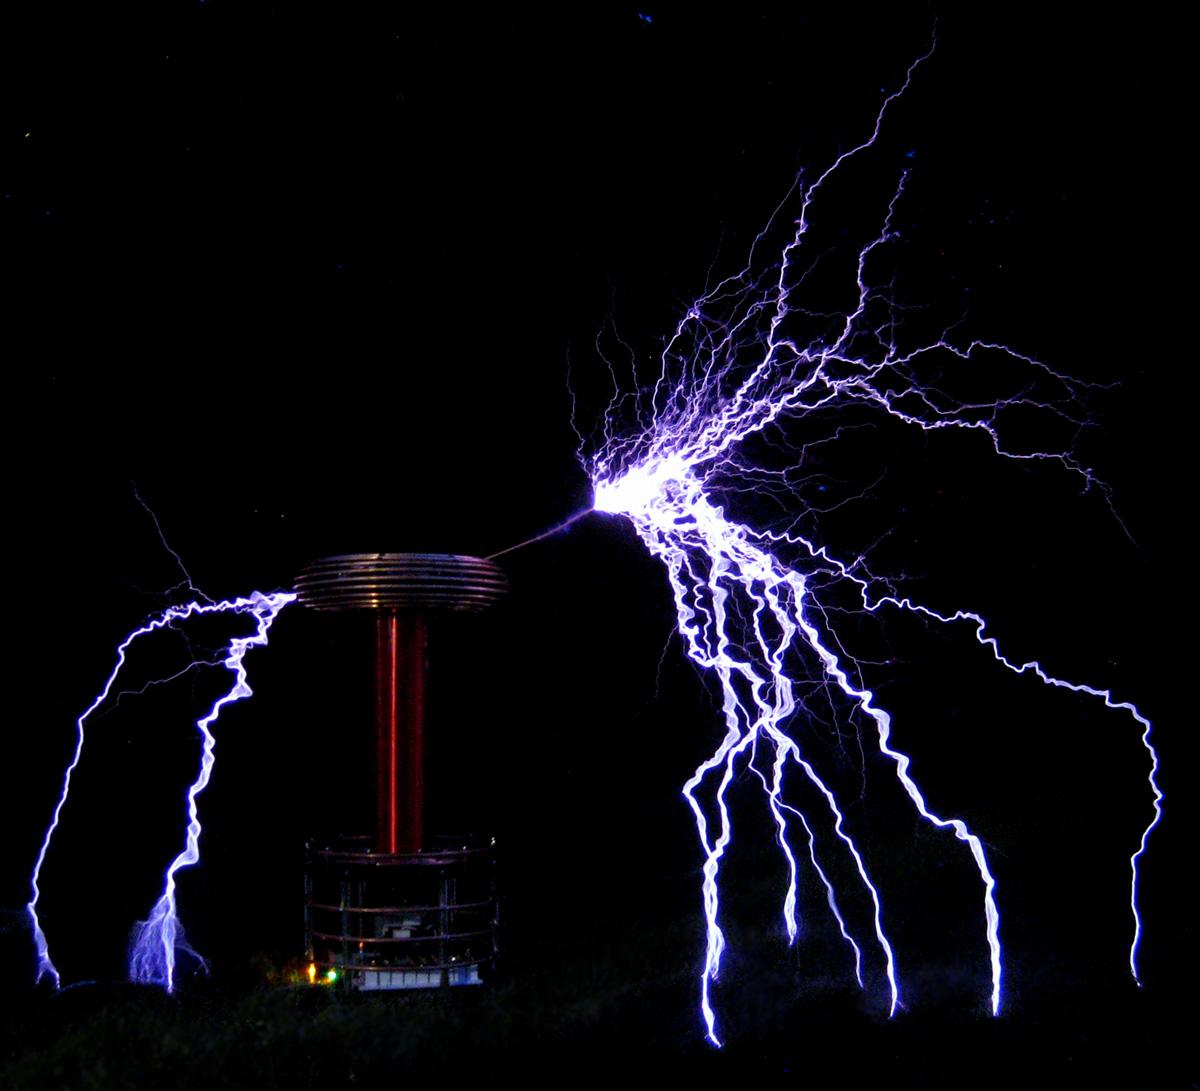 Zeusaphone Z-85 Tesla coil arcing like crazy